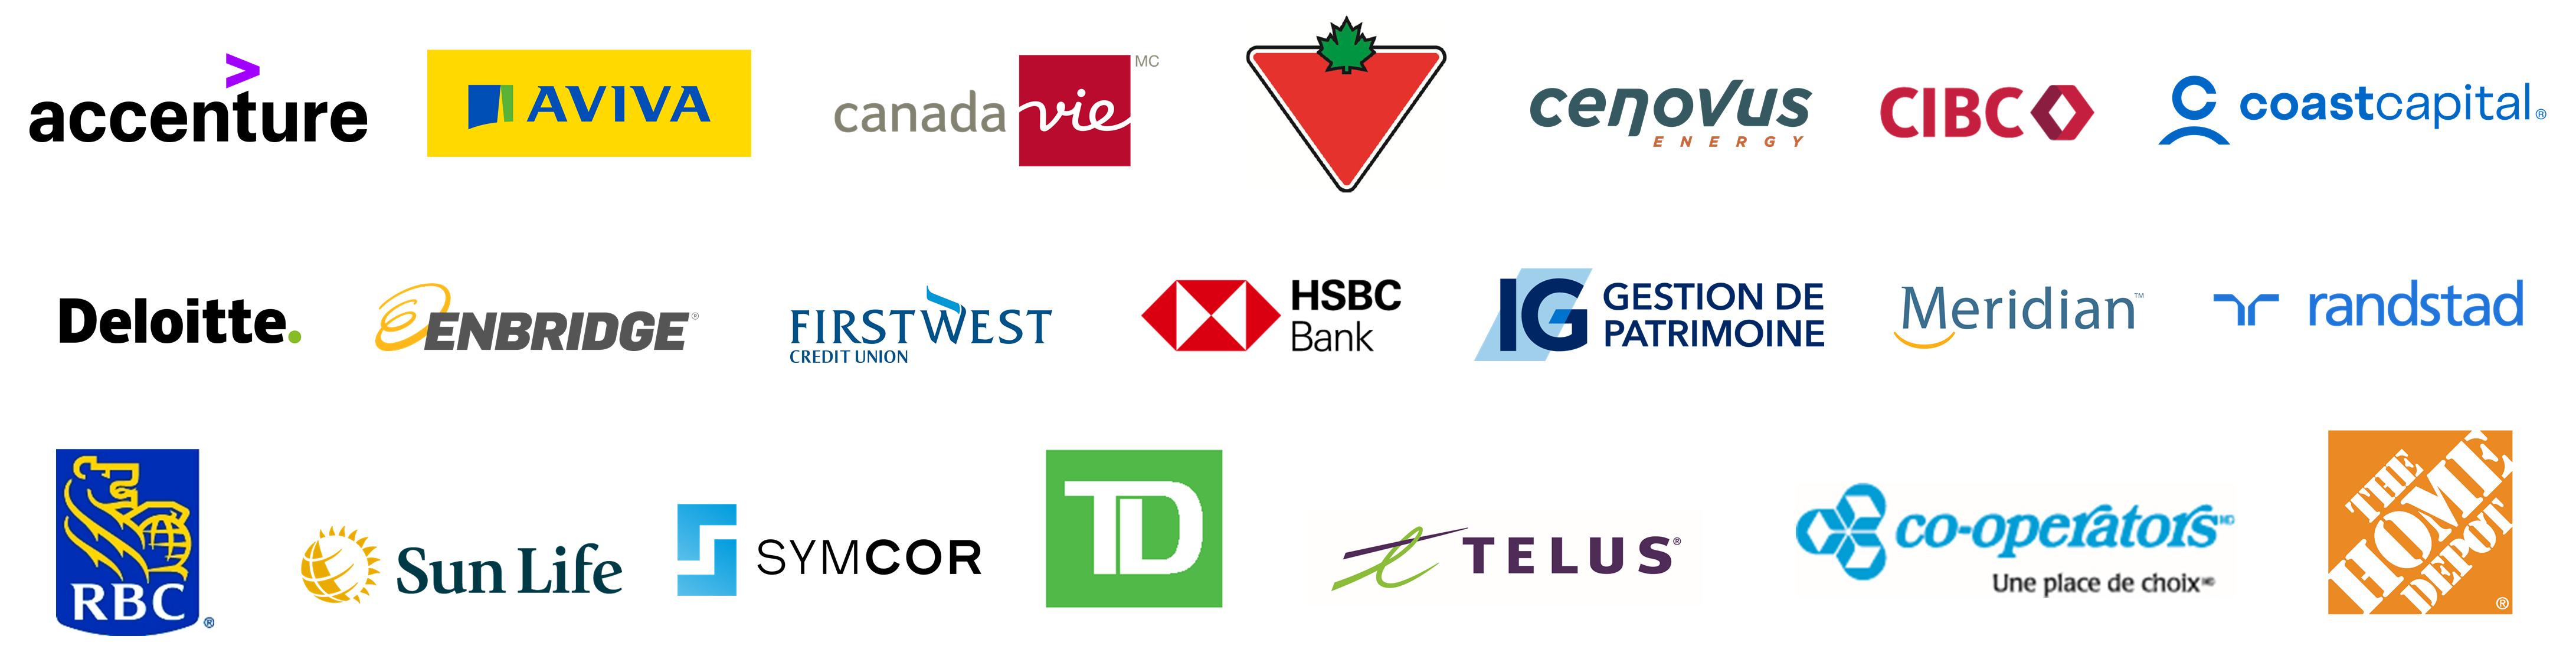 Accenture - Aviva - Canada vie- Canadian Tire - Cenovus Energy CIBC - Coast Capital - Deloitte - Enbridge - First West Credit Union HSBC Bank - IG gestion de patrimoine- Meridian - Randstad - RBC Sun Life- Symcor - TD- Telus - The Co-operators- The Home Depot